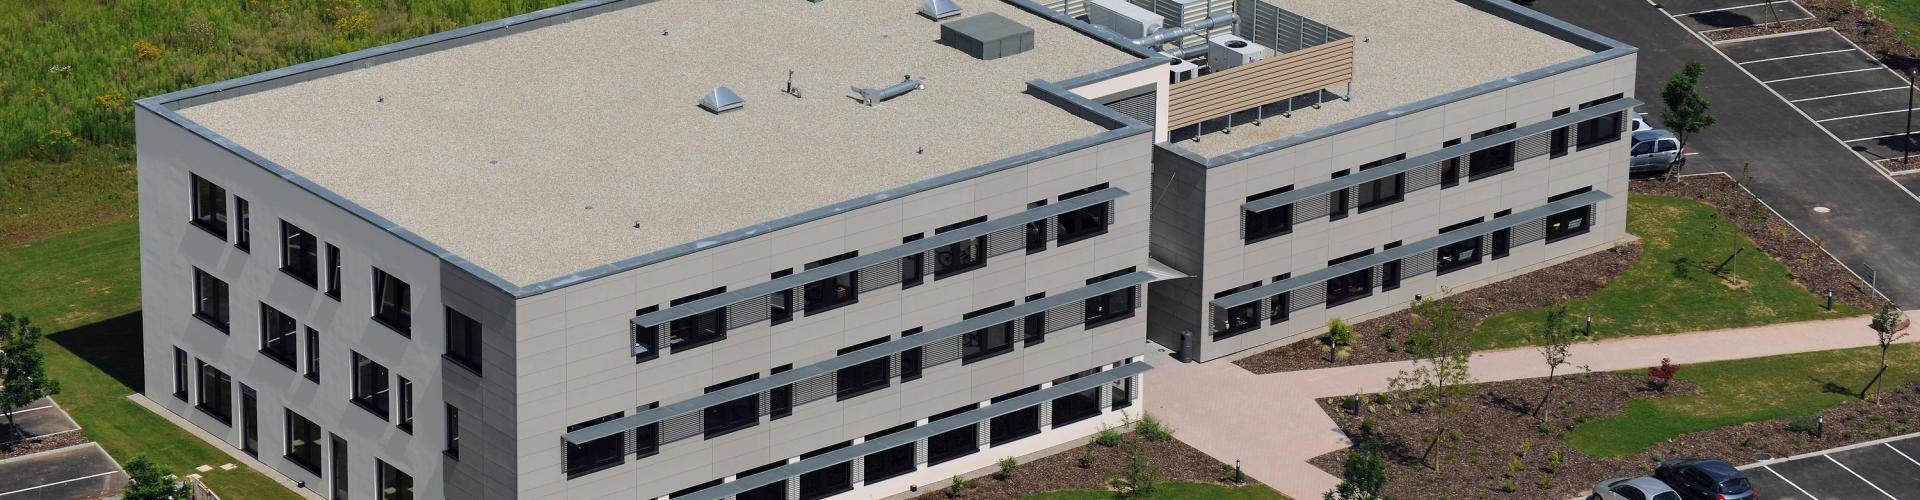 Immobilier bureau neuf Spex - Entzheim